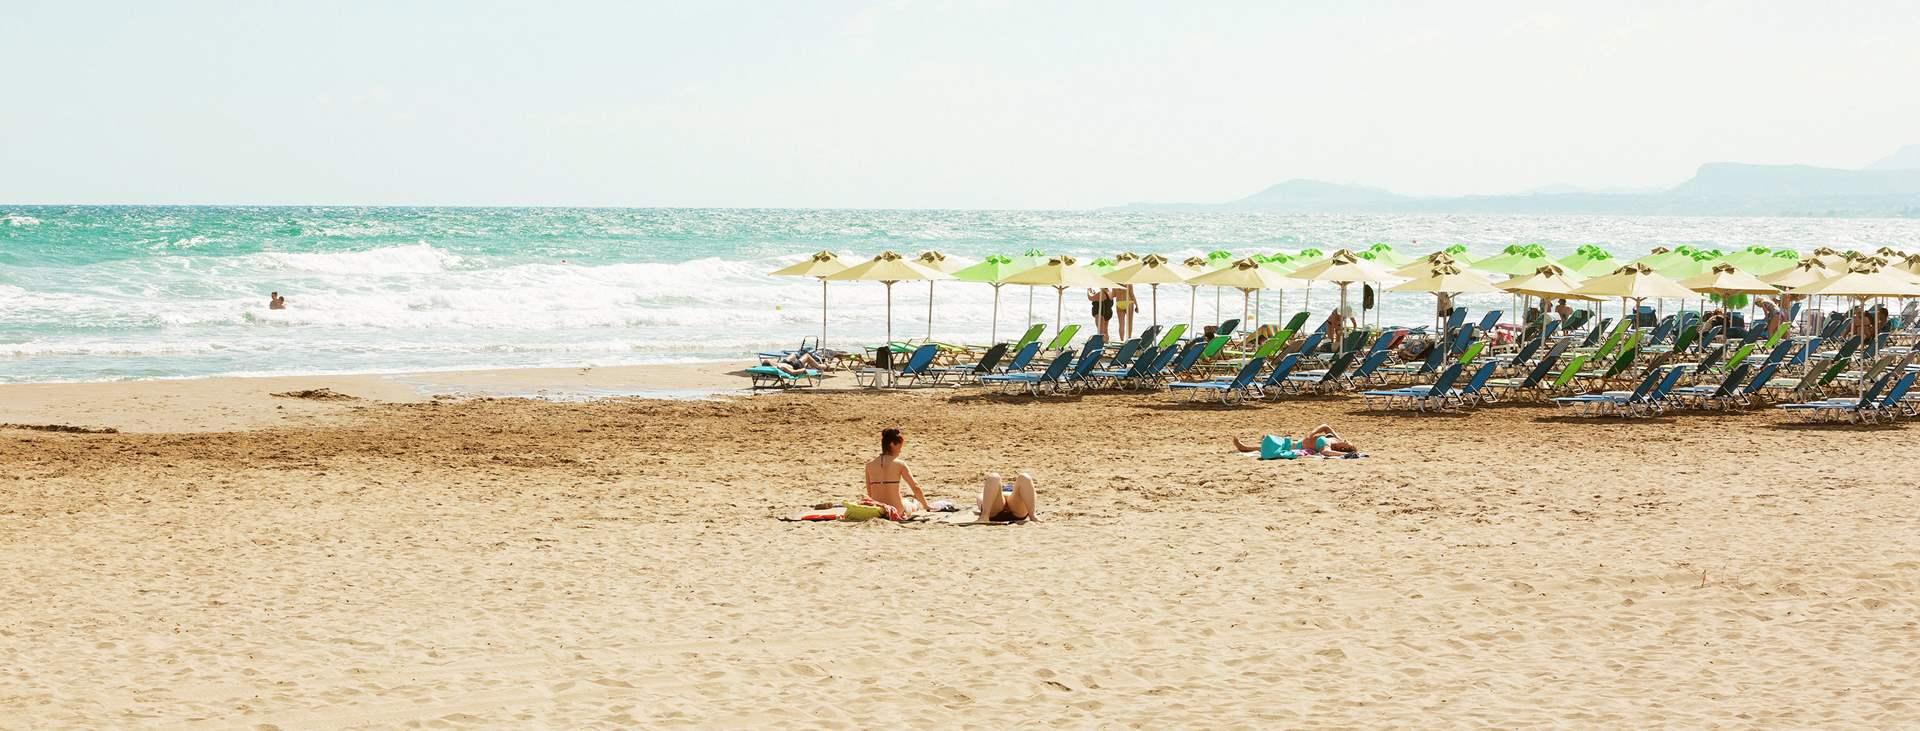 Bestill en reise med All Inclusive til Rethymnon på Kreta